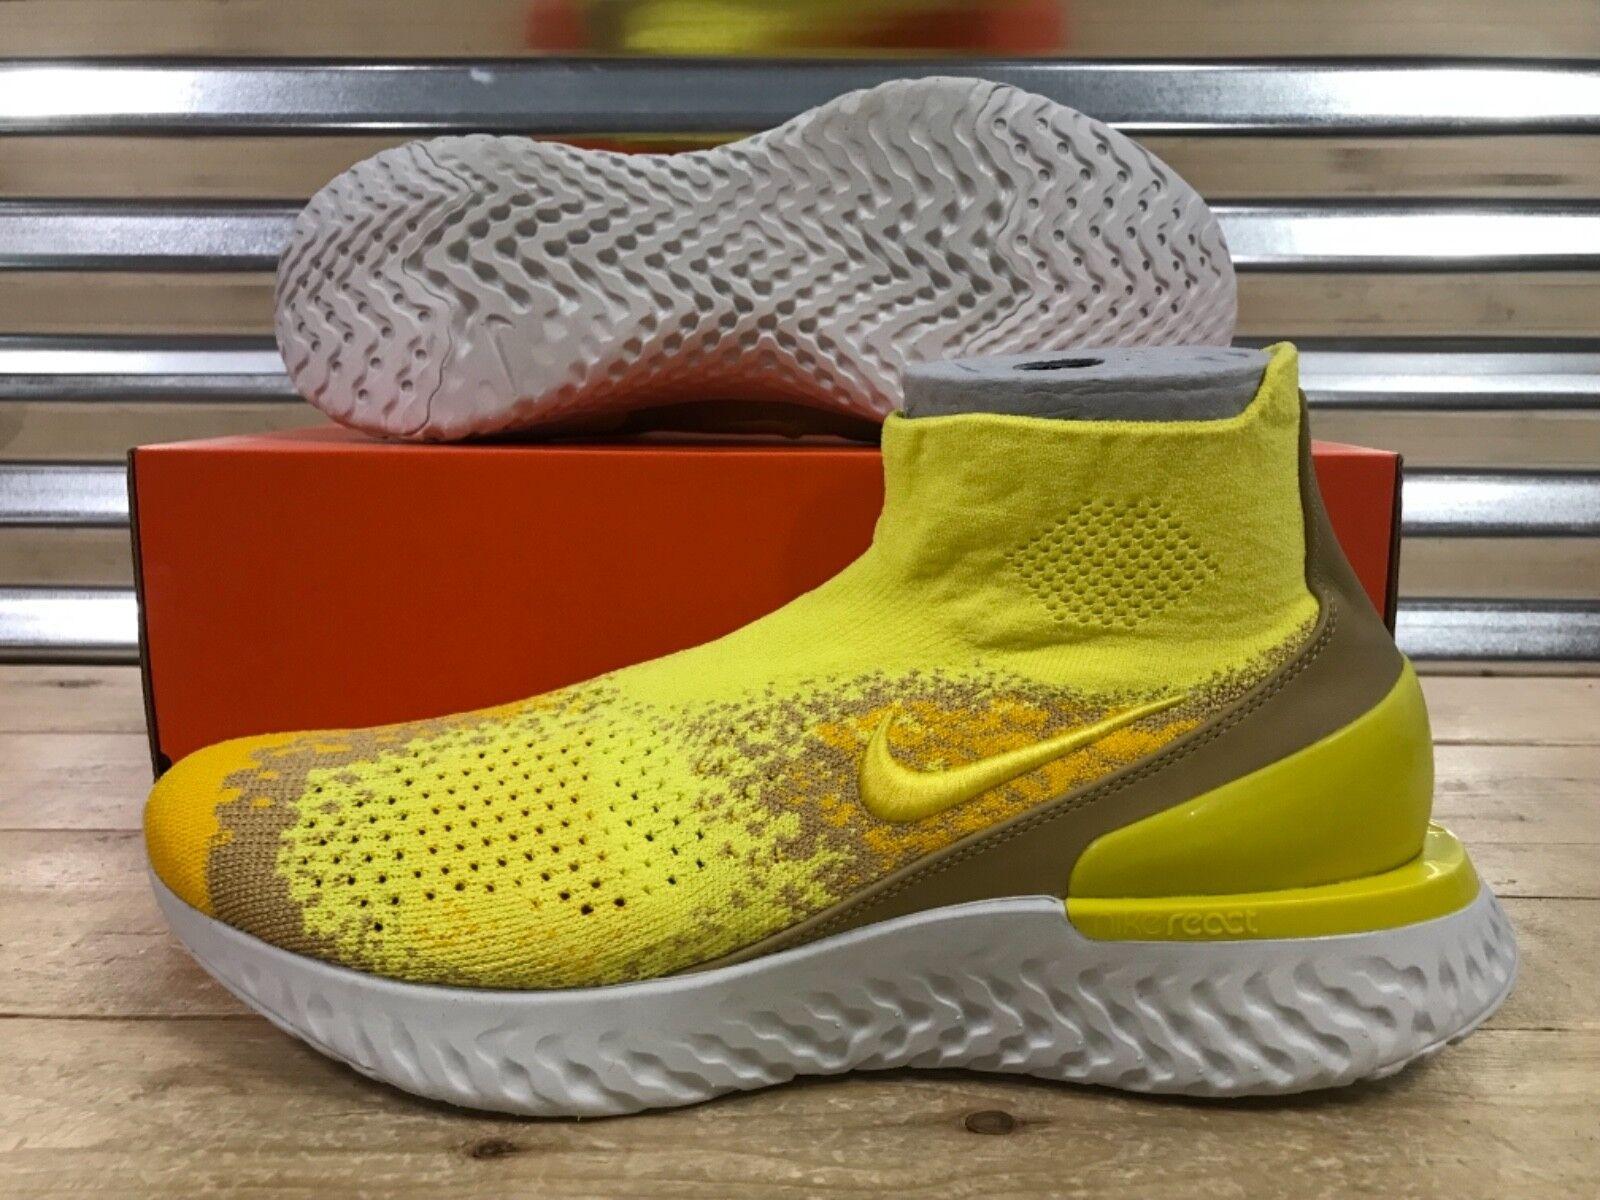 Nike Rise React Flyknit Limited Running schuhe Sonic Gelb Weiß SZ (BQ6176-707)